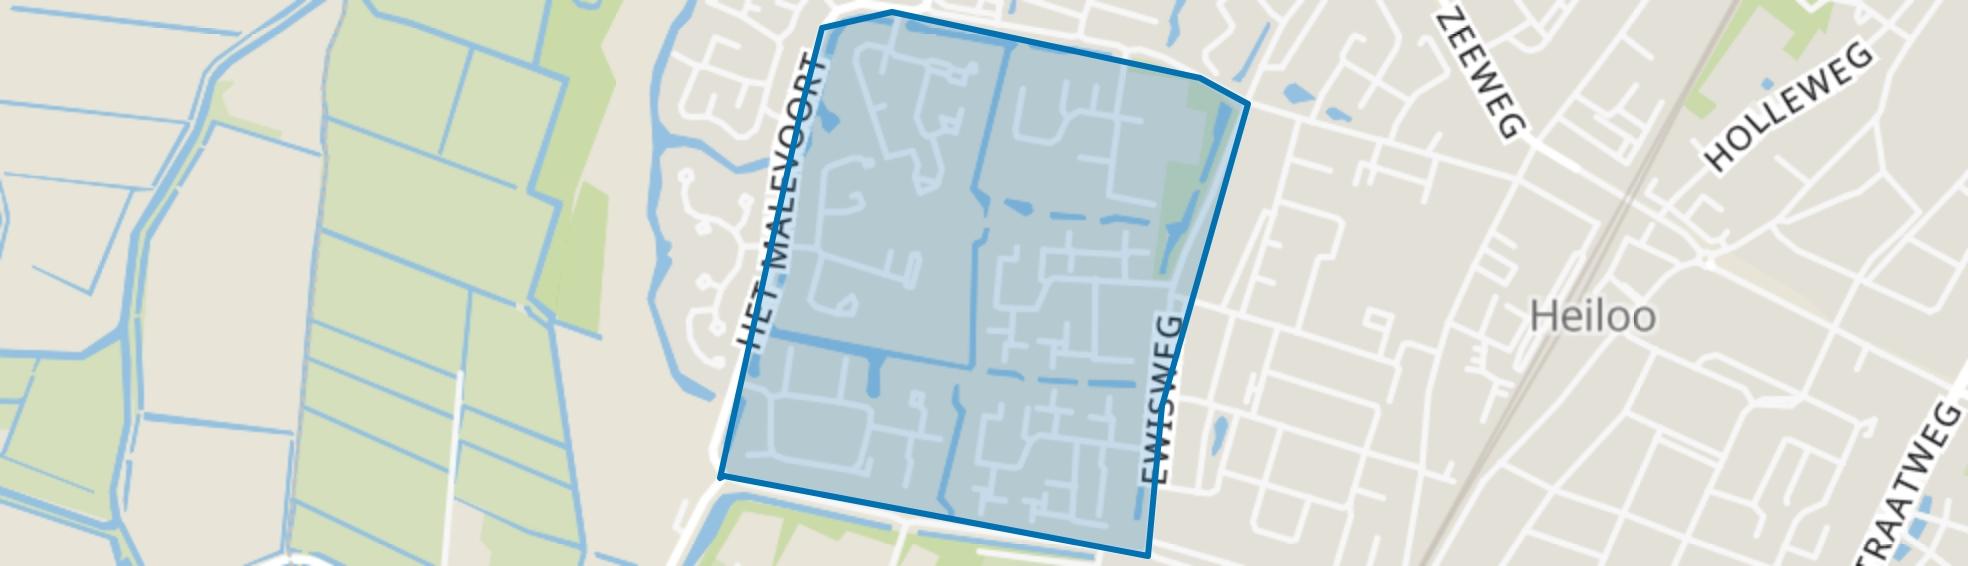 Zuid West, Heiloo map